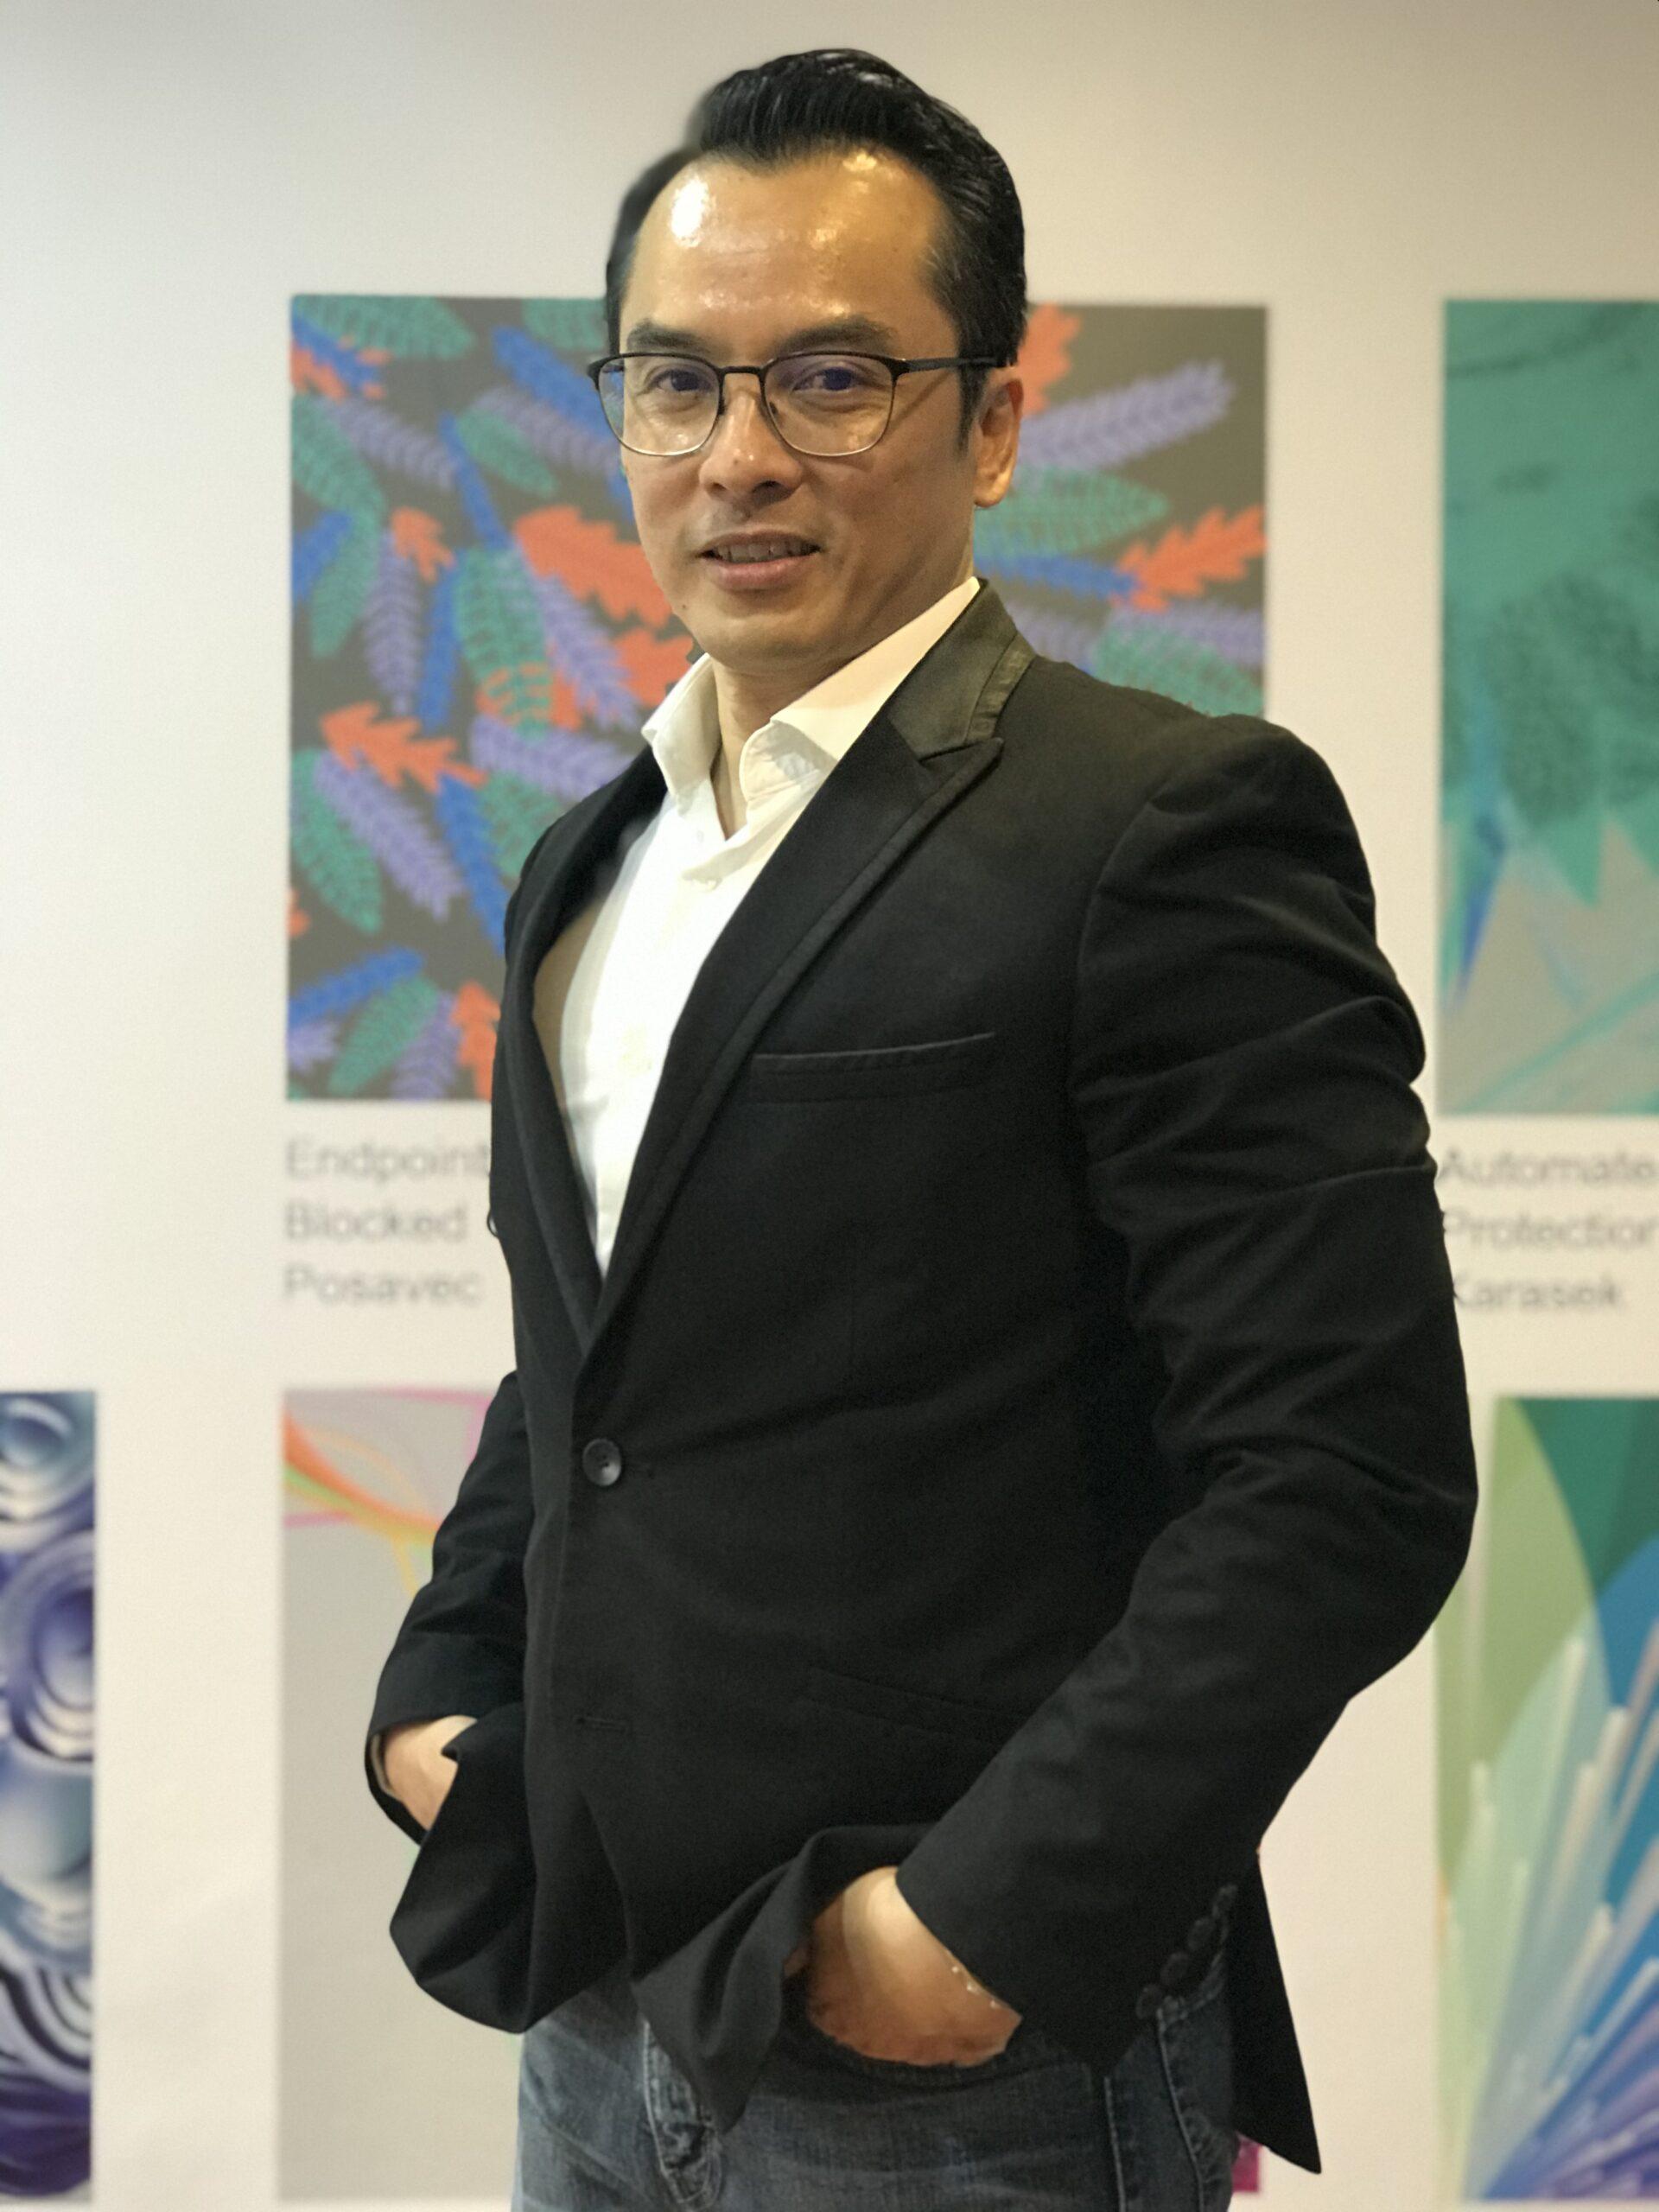 DR. ISKANDAR ILLYAS TAN